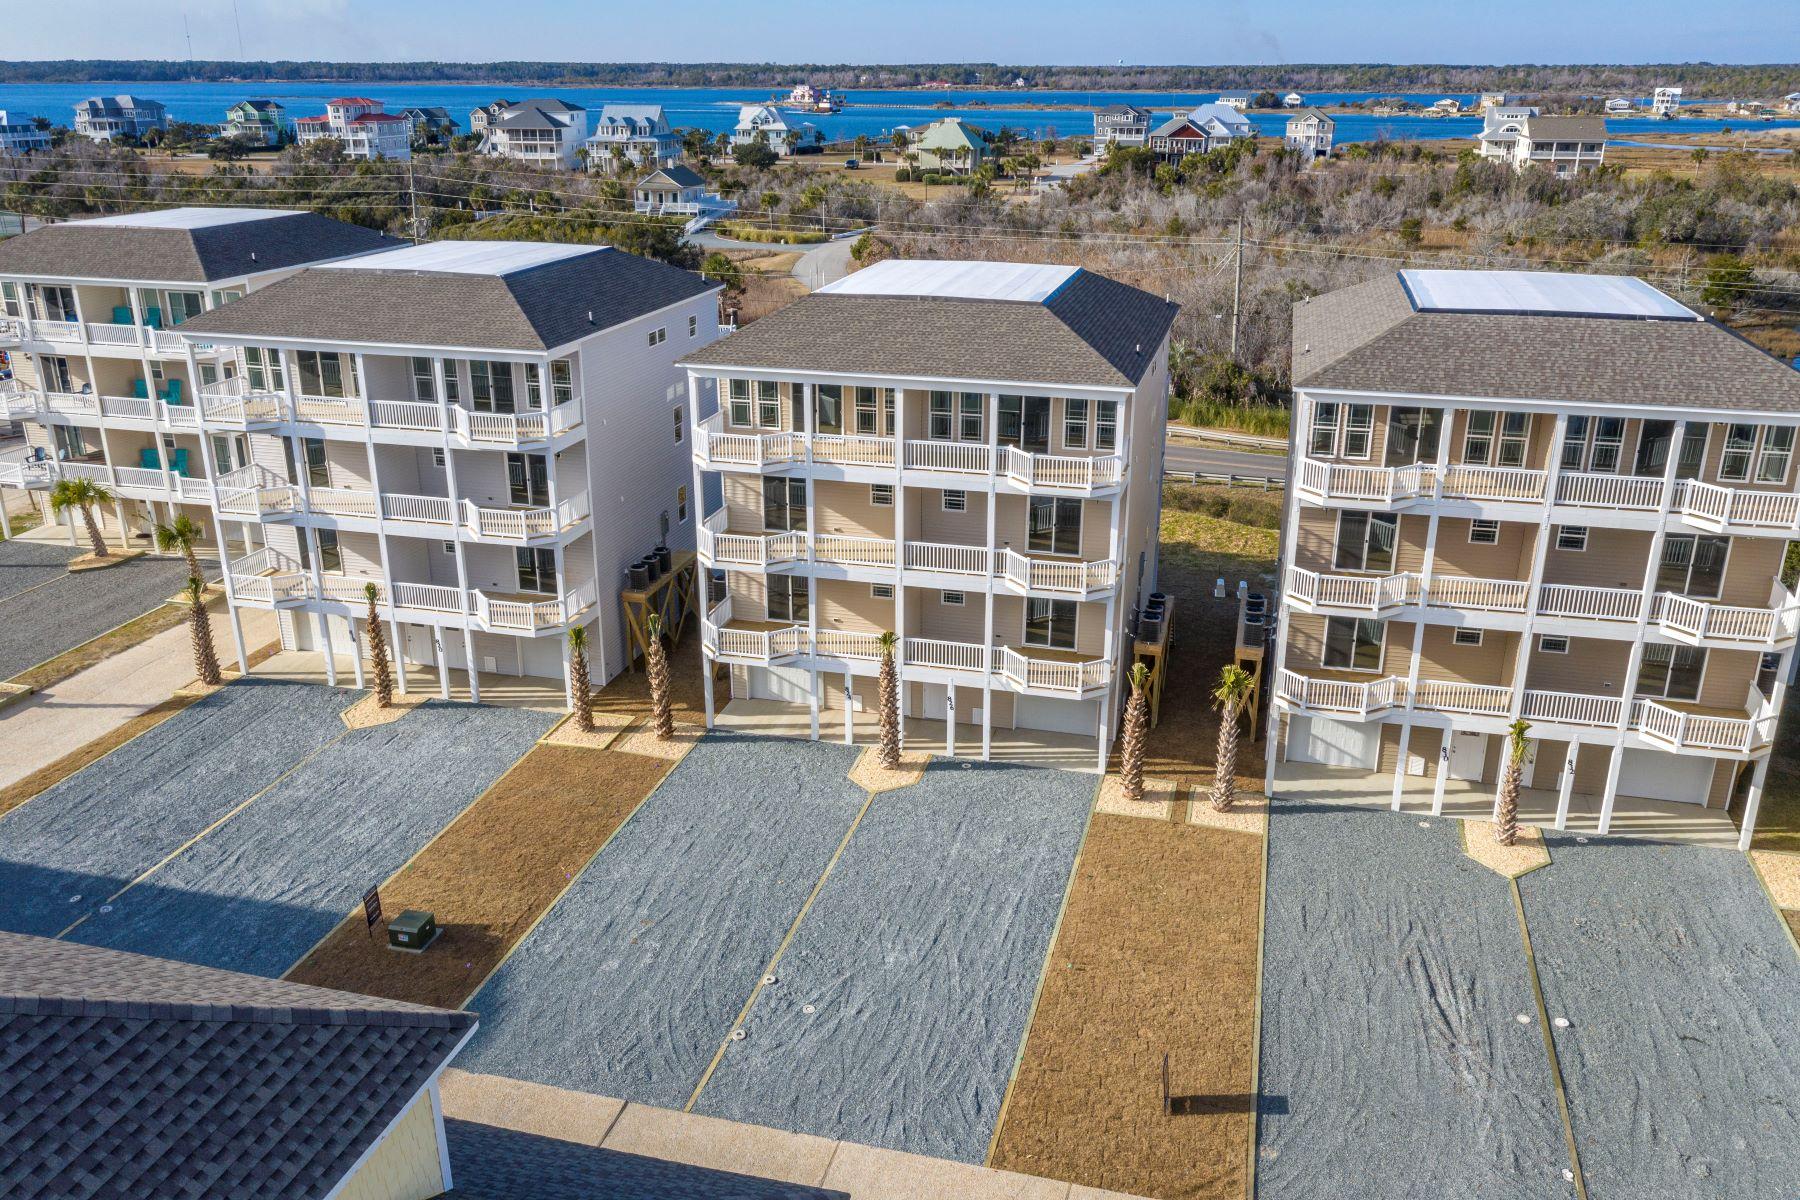 townhouses for Active at Villa on Topsail Island 832 Villas Drive N Topsail Beach, North Carolina 28460 United States